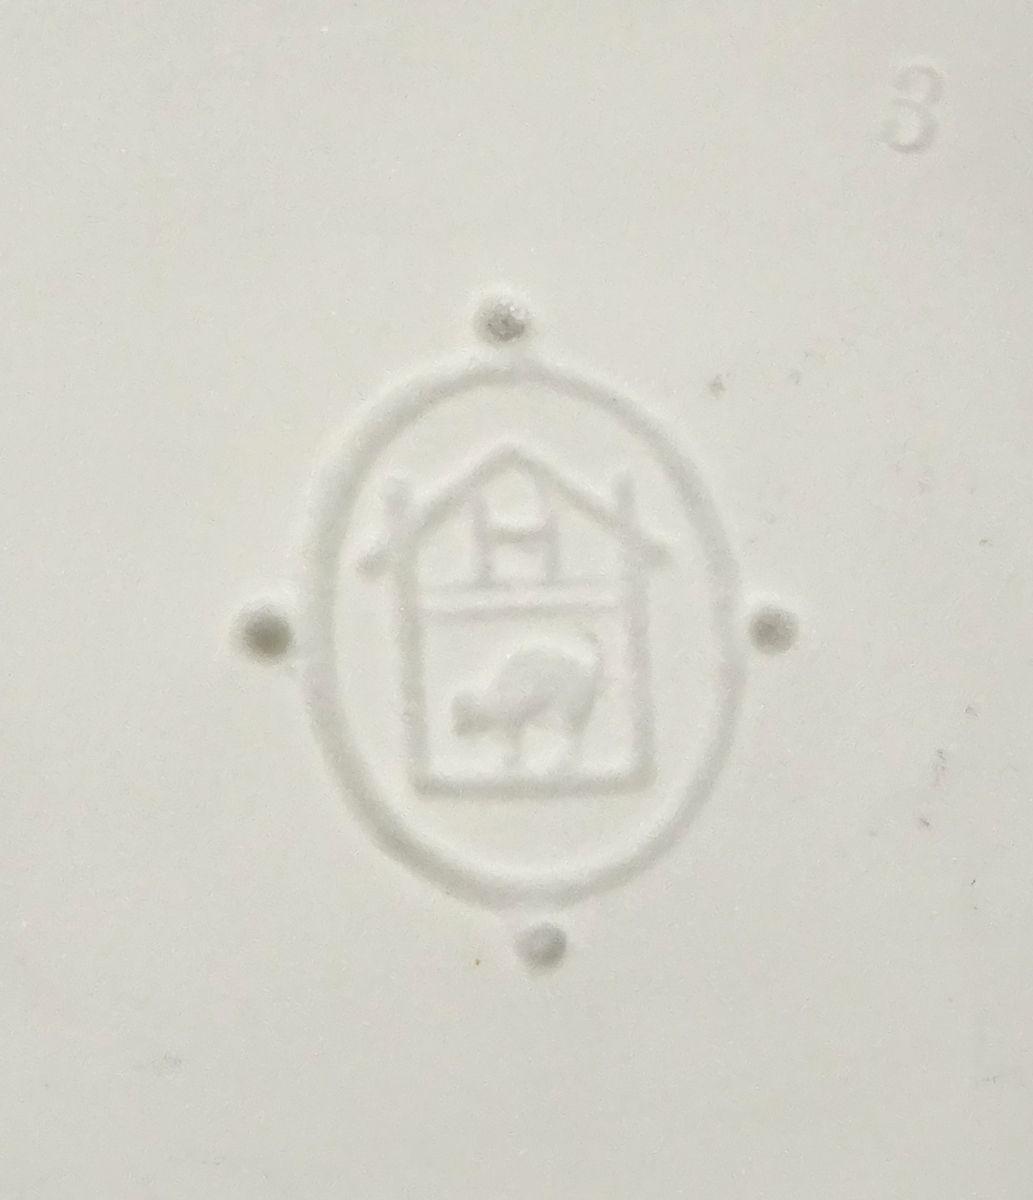 DSC07936.JPG (1033×1200)